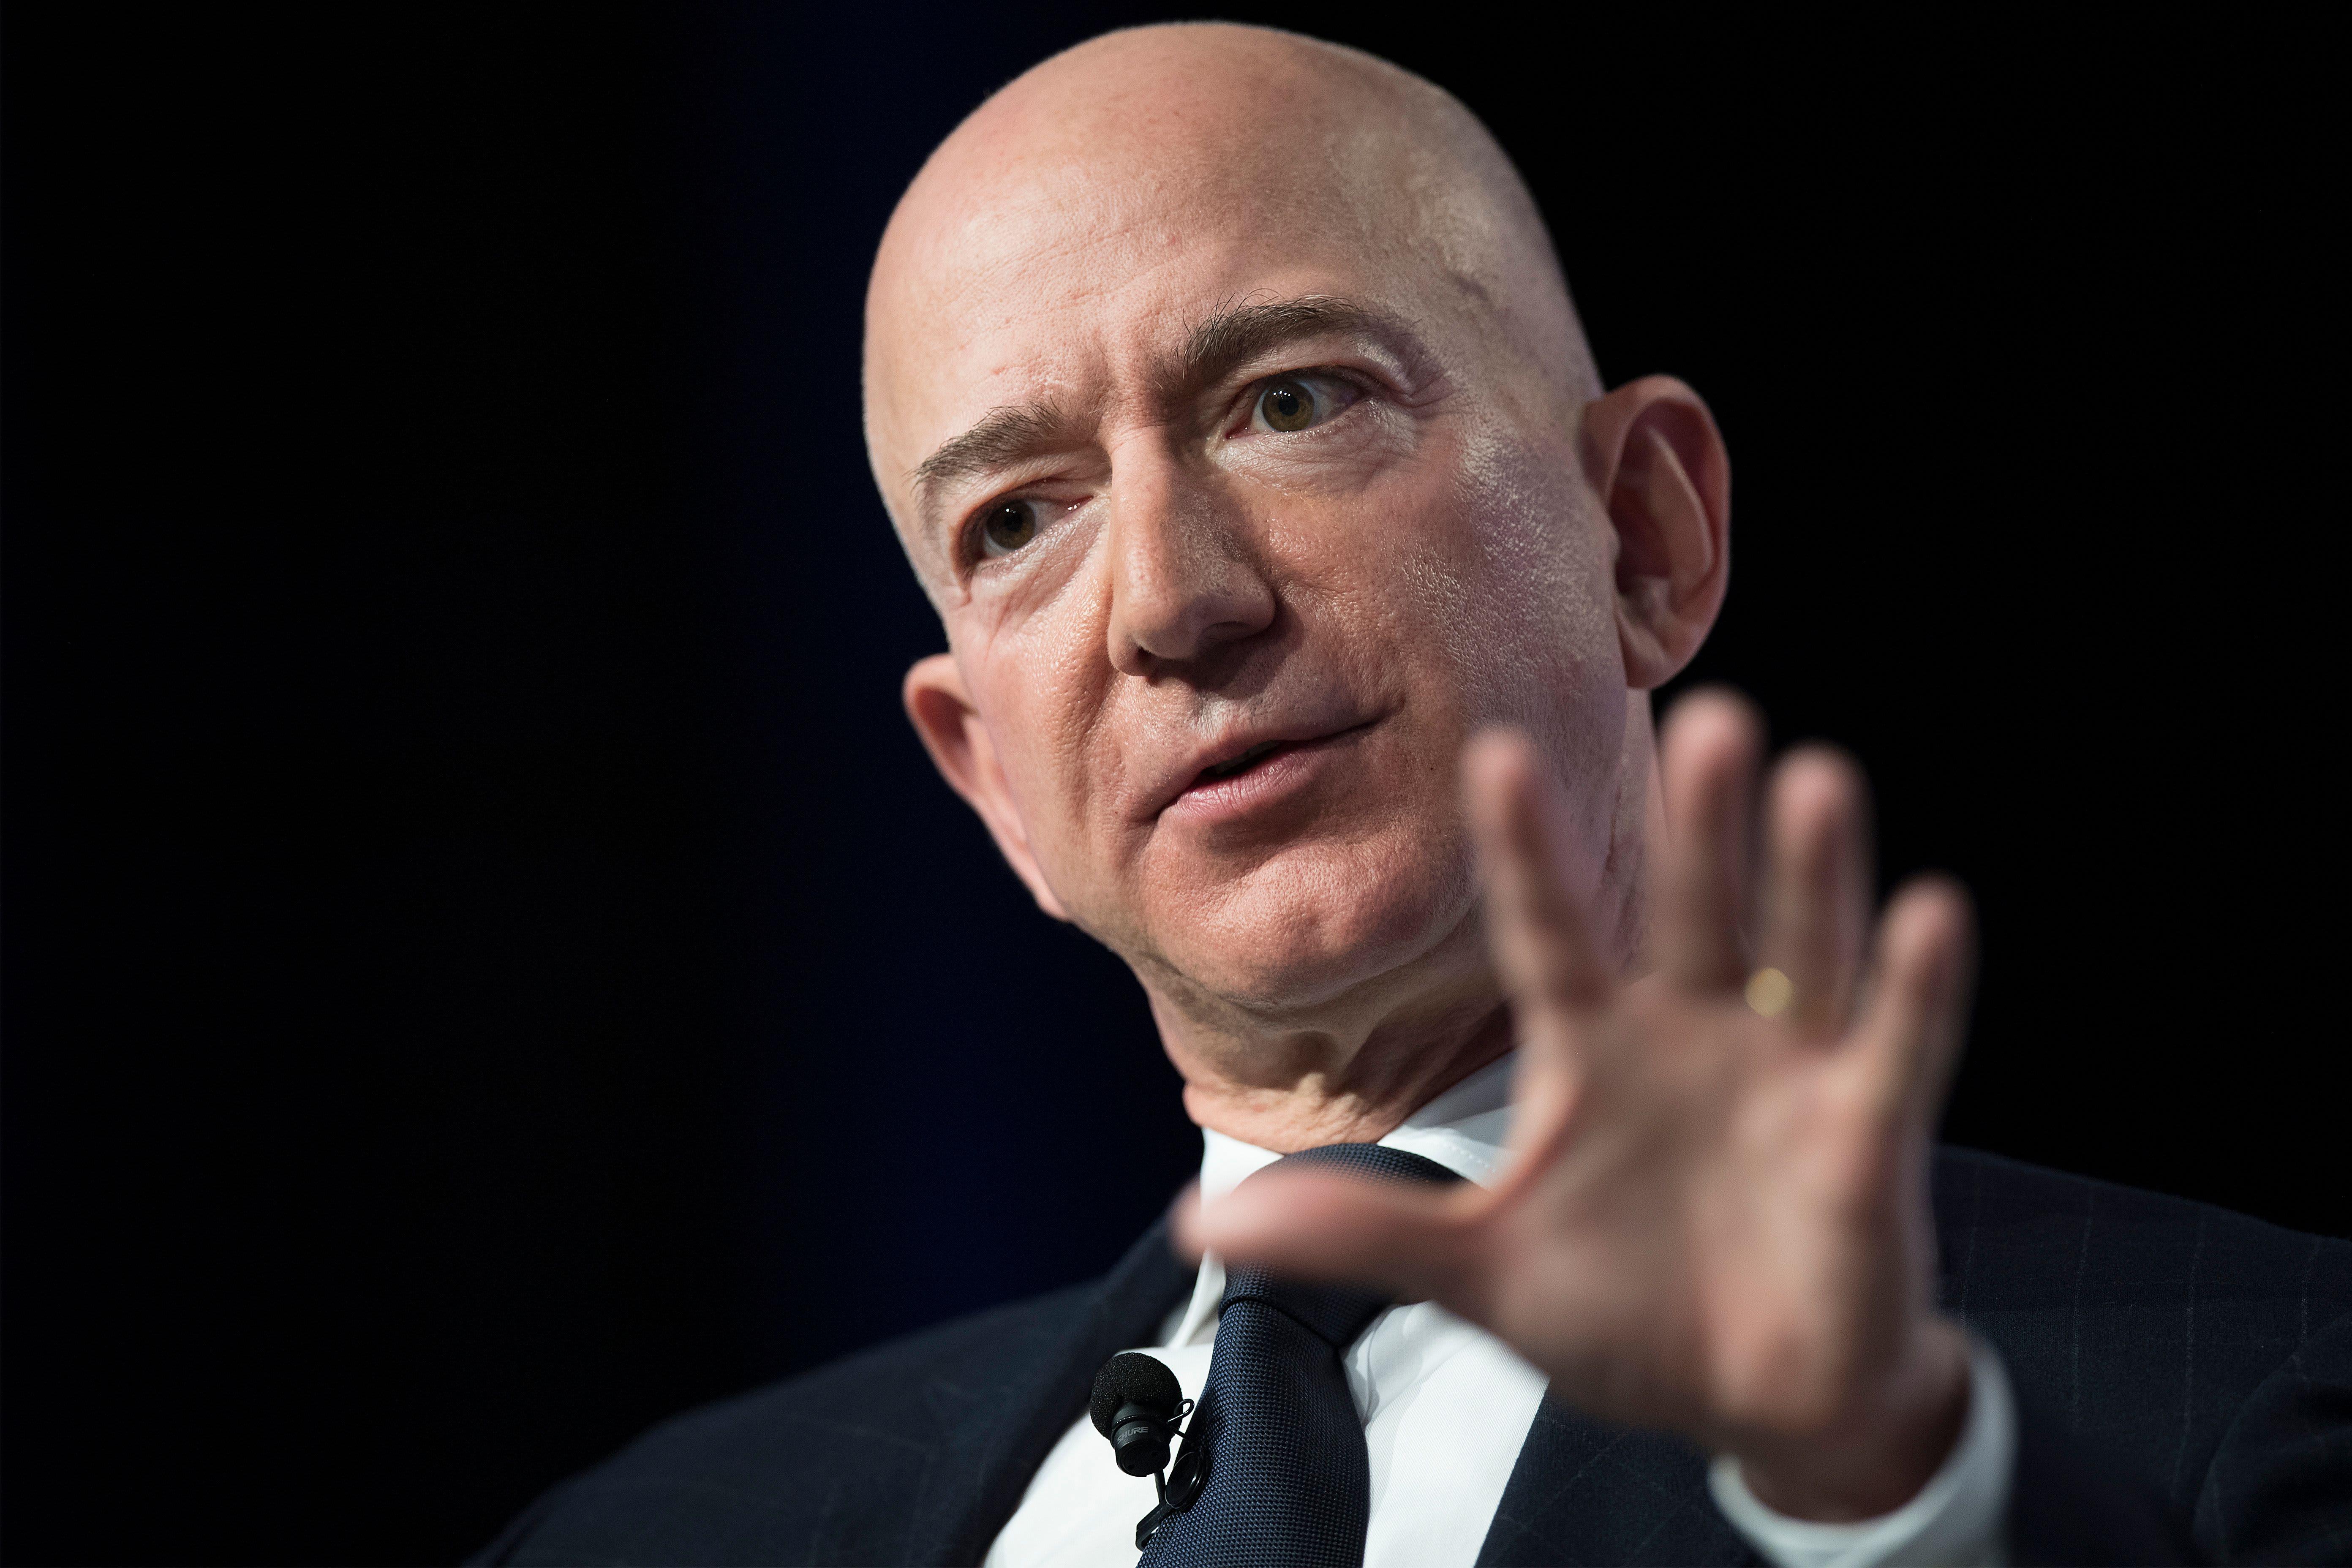 Major analysts predict Amazon's earnings report